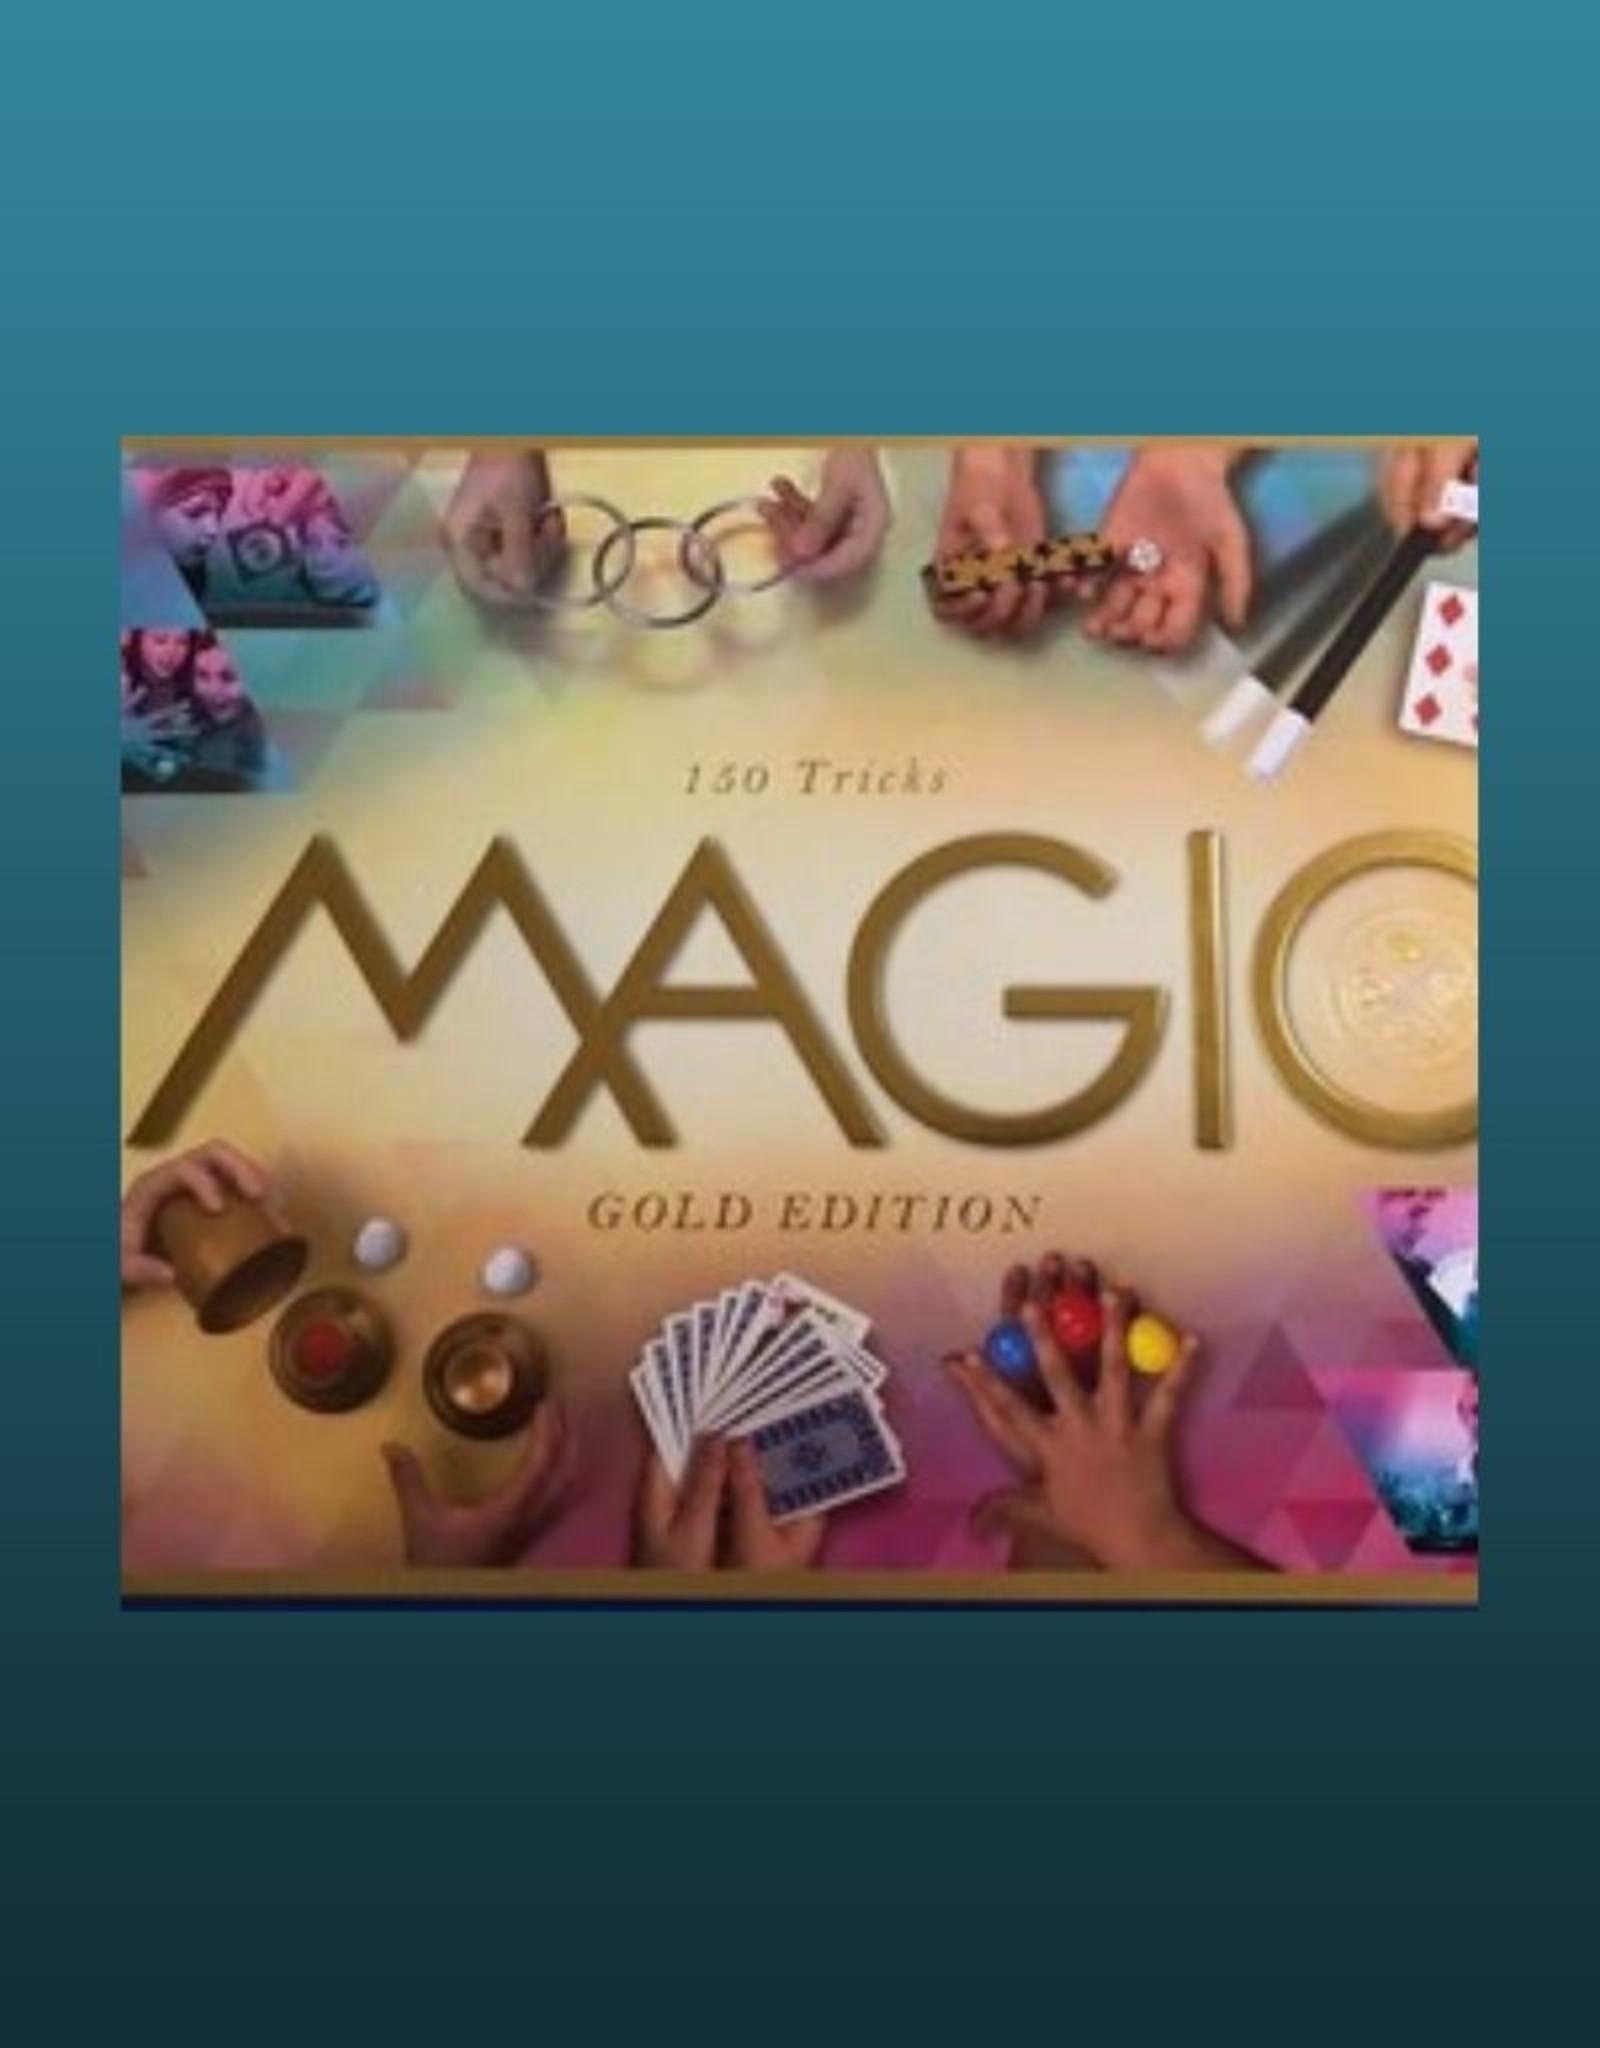 GOLD 150 TRICKS MAGIC